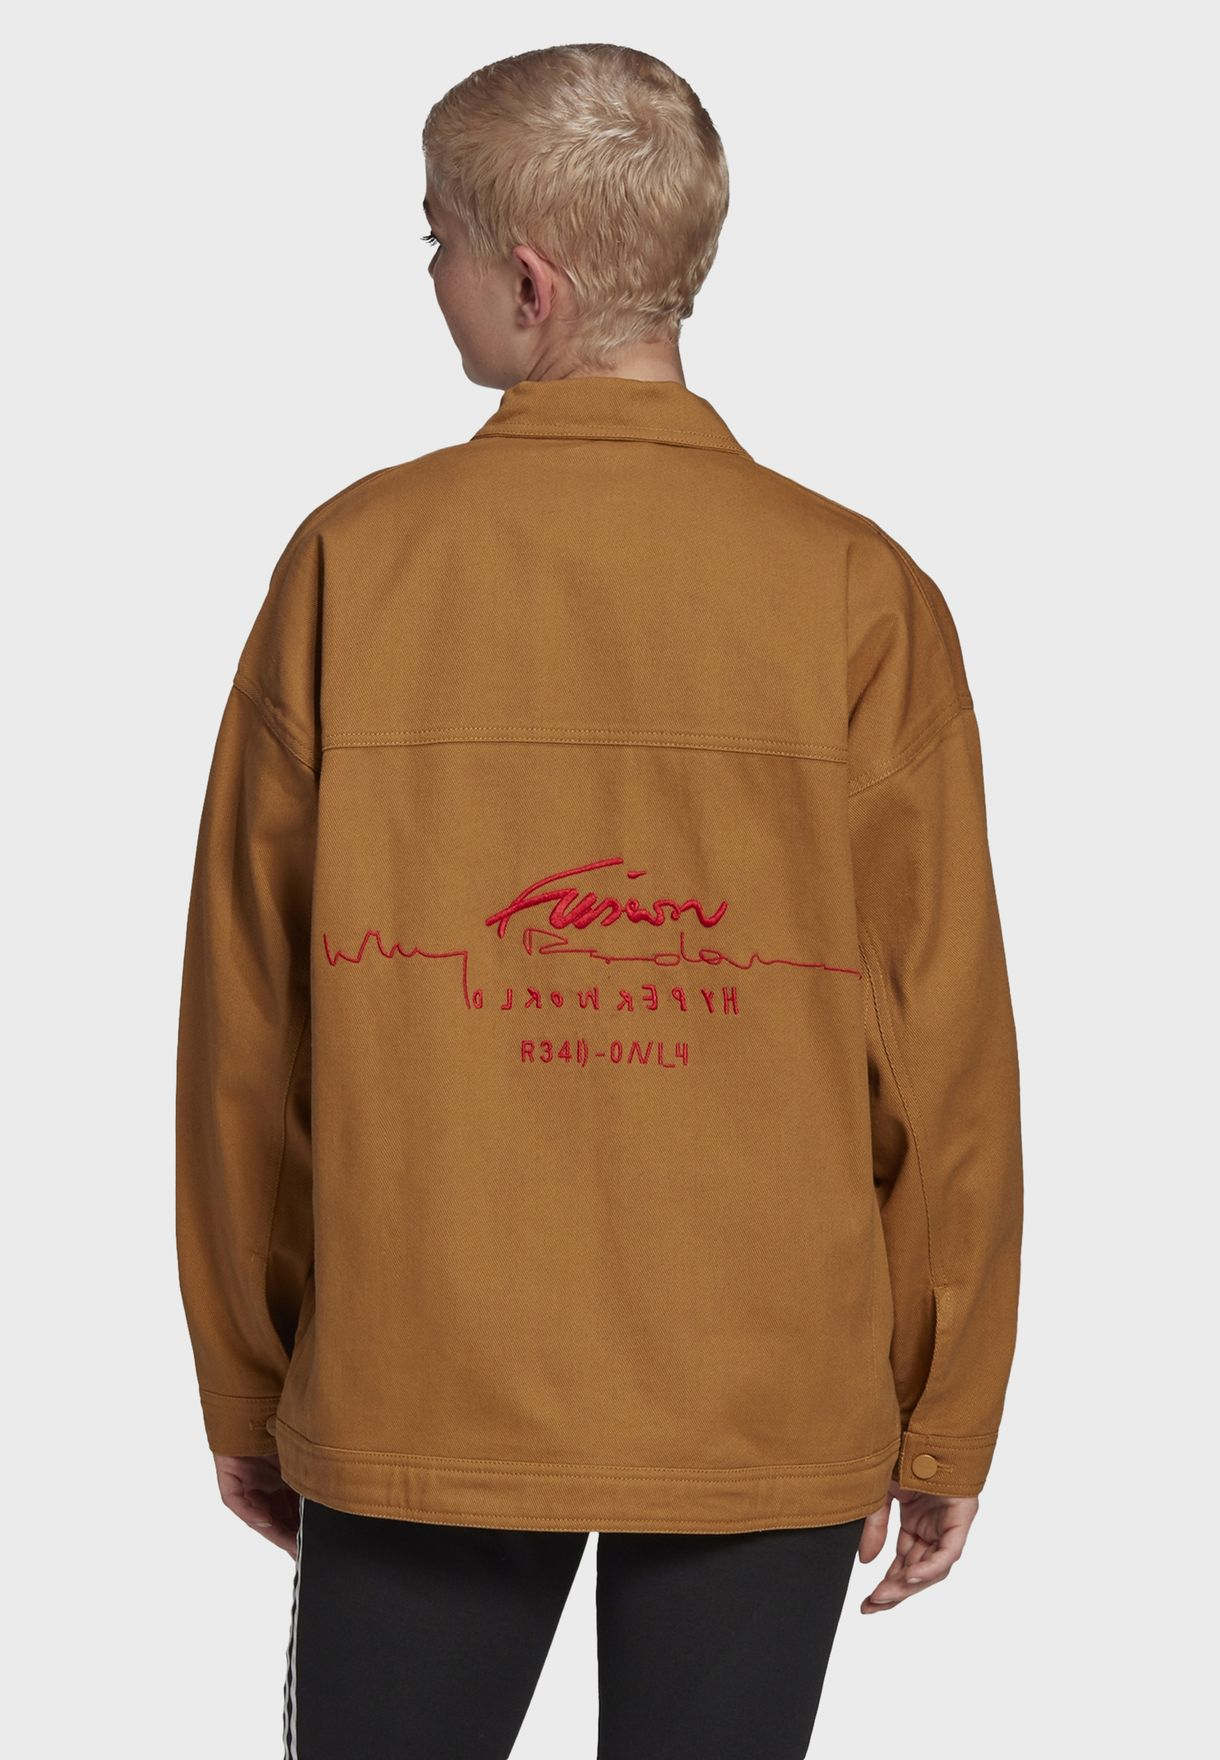 R.Y.V. Jacket